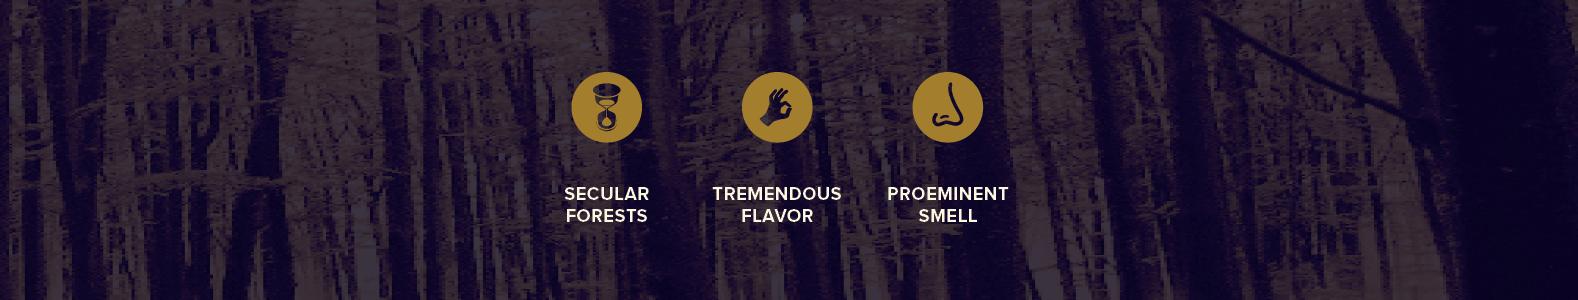 bio-pico-truffle-forrests